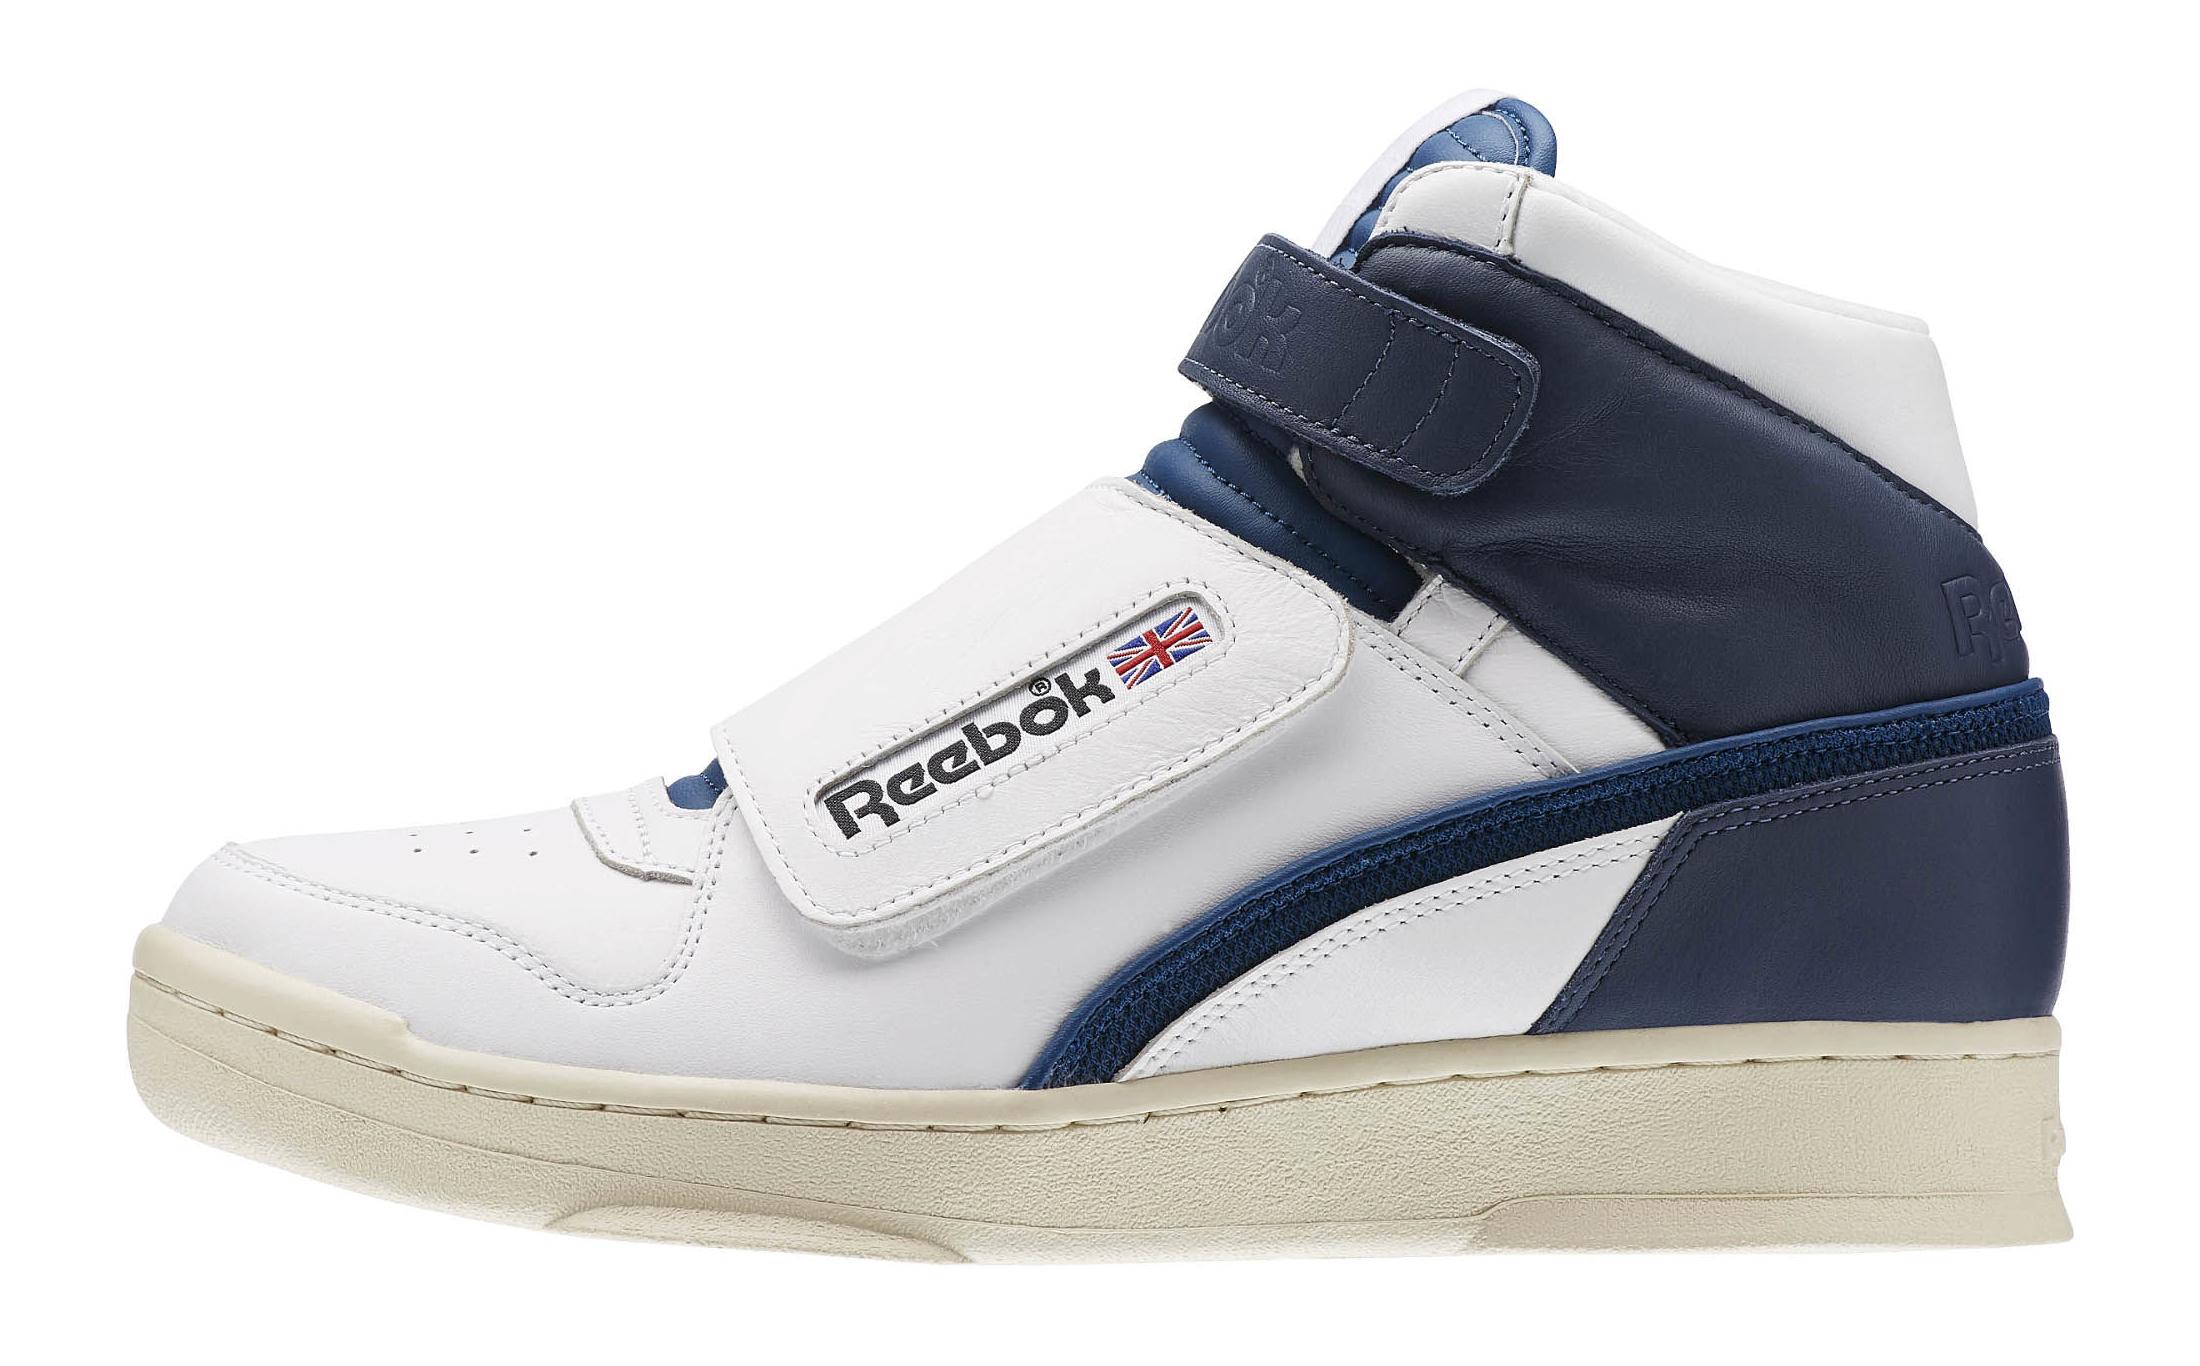 Reebok Alien Stomper Mid Navy White Profile 1fe89f299